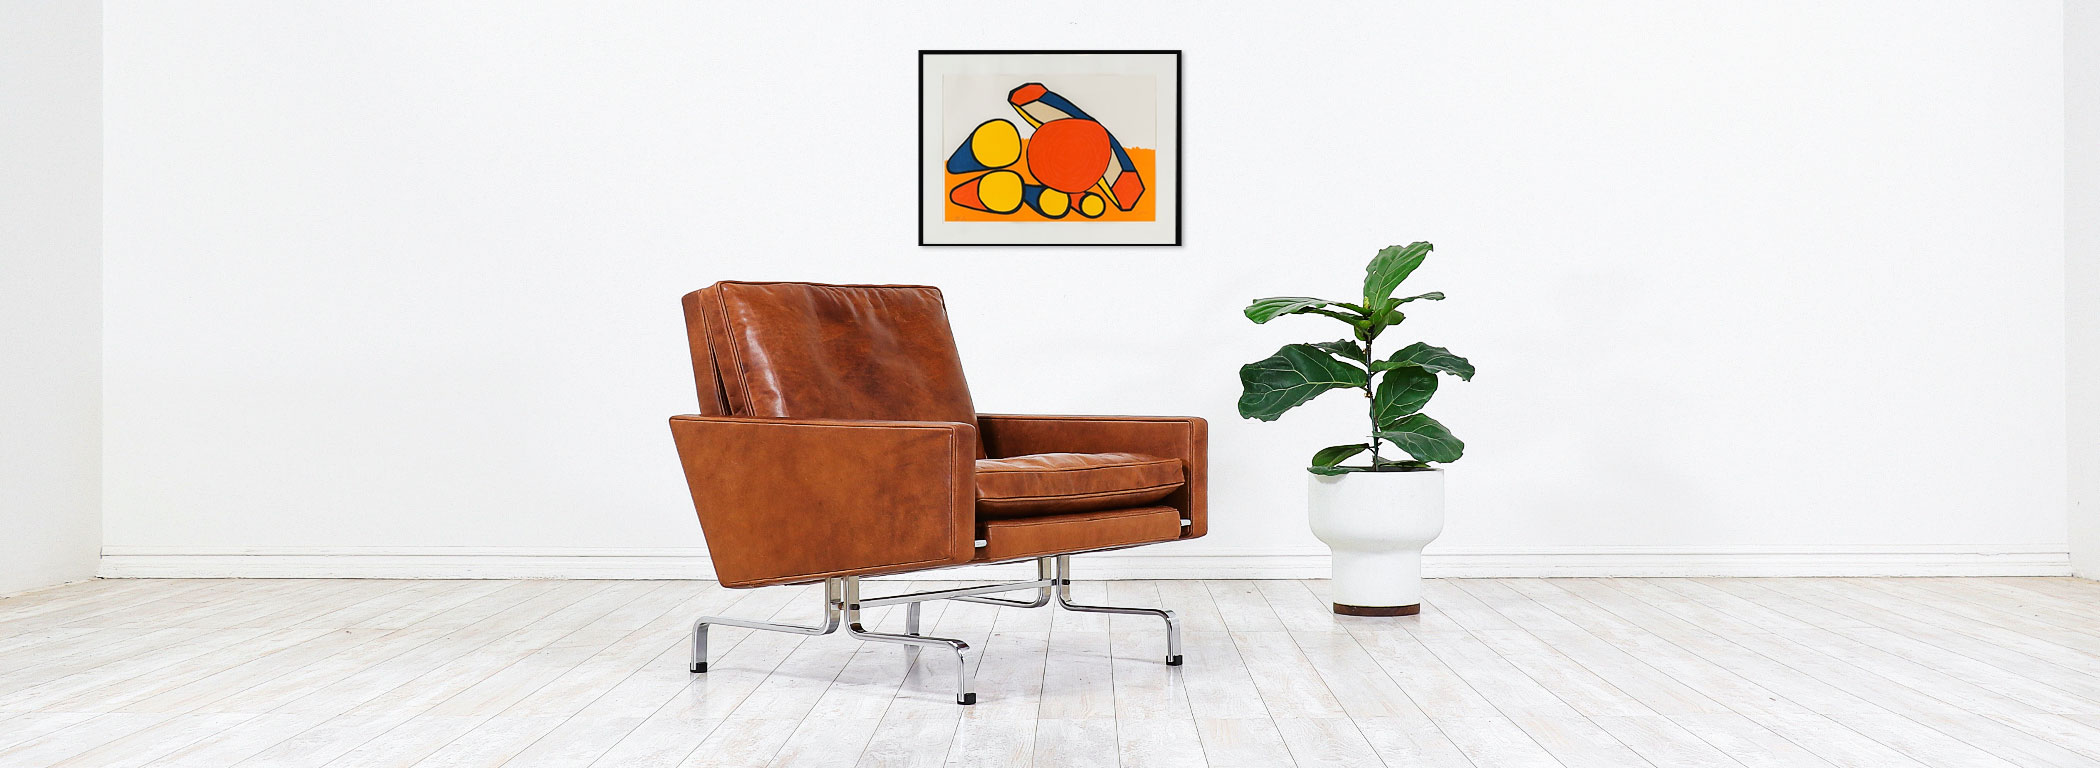 Poul Kjaerholm PK-31 Leather Lounge Chair for E. Kold Christensen  Image